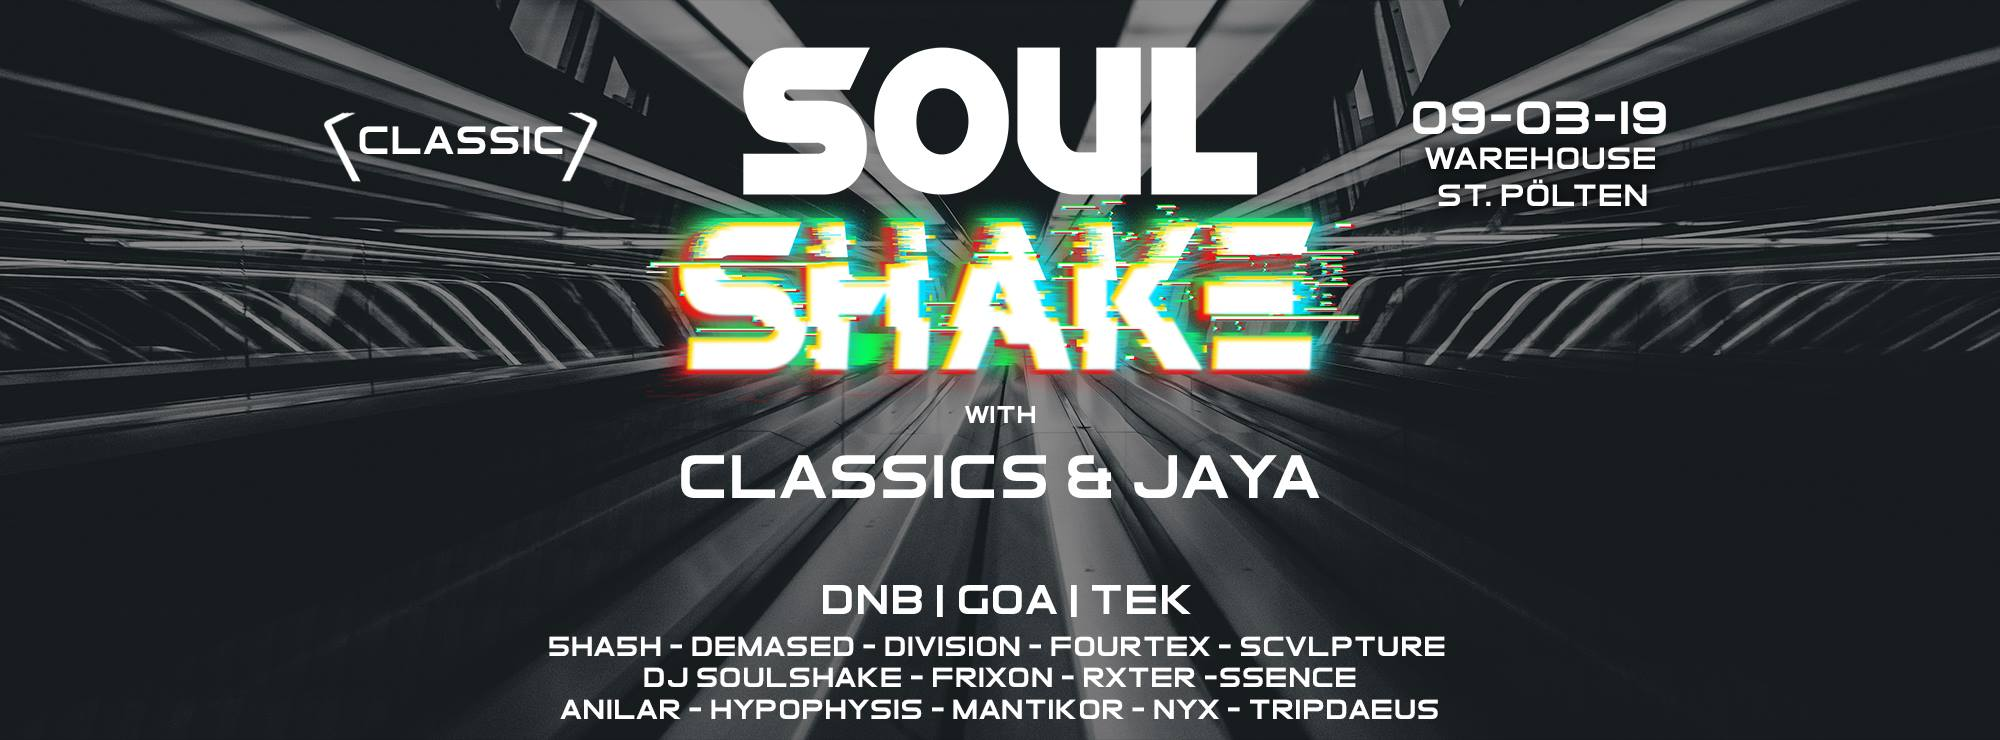 Soulshake classics & Jaya